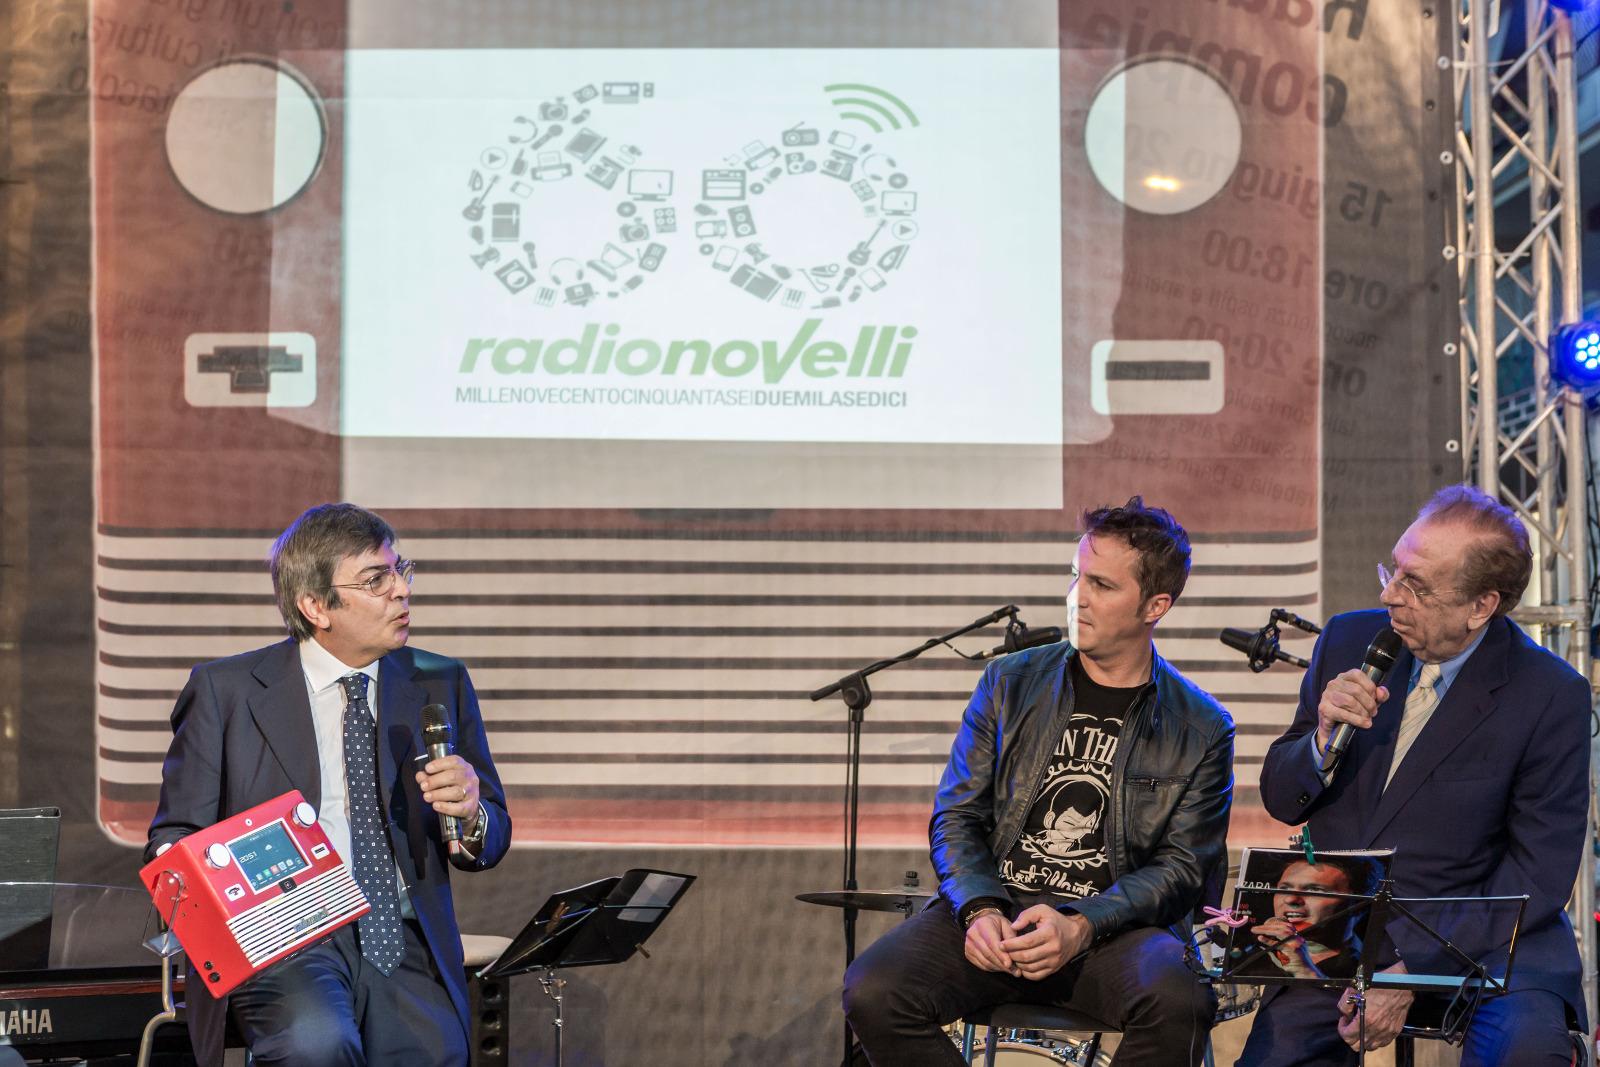 Radio4g per i 60 anni di radionovelli